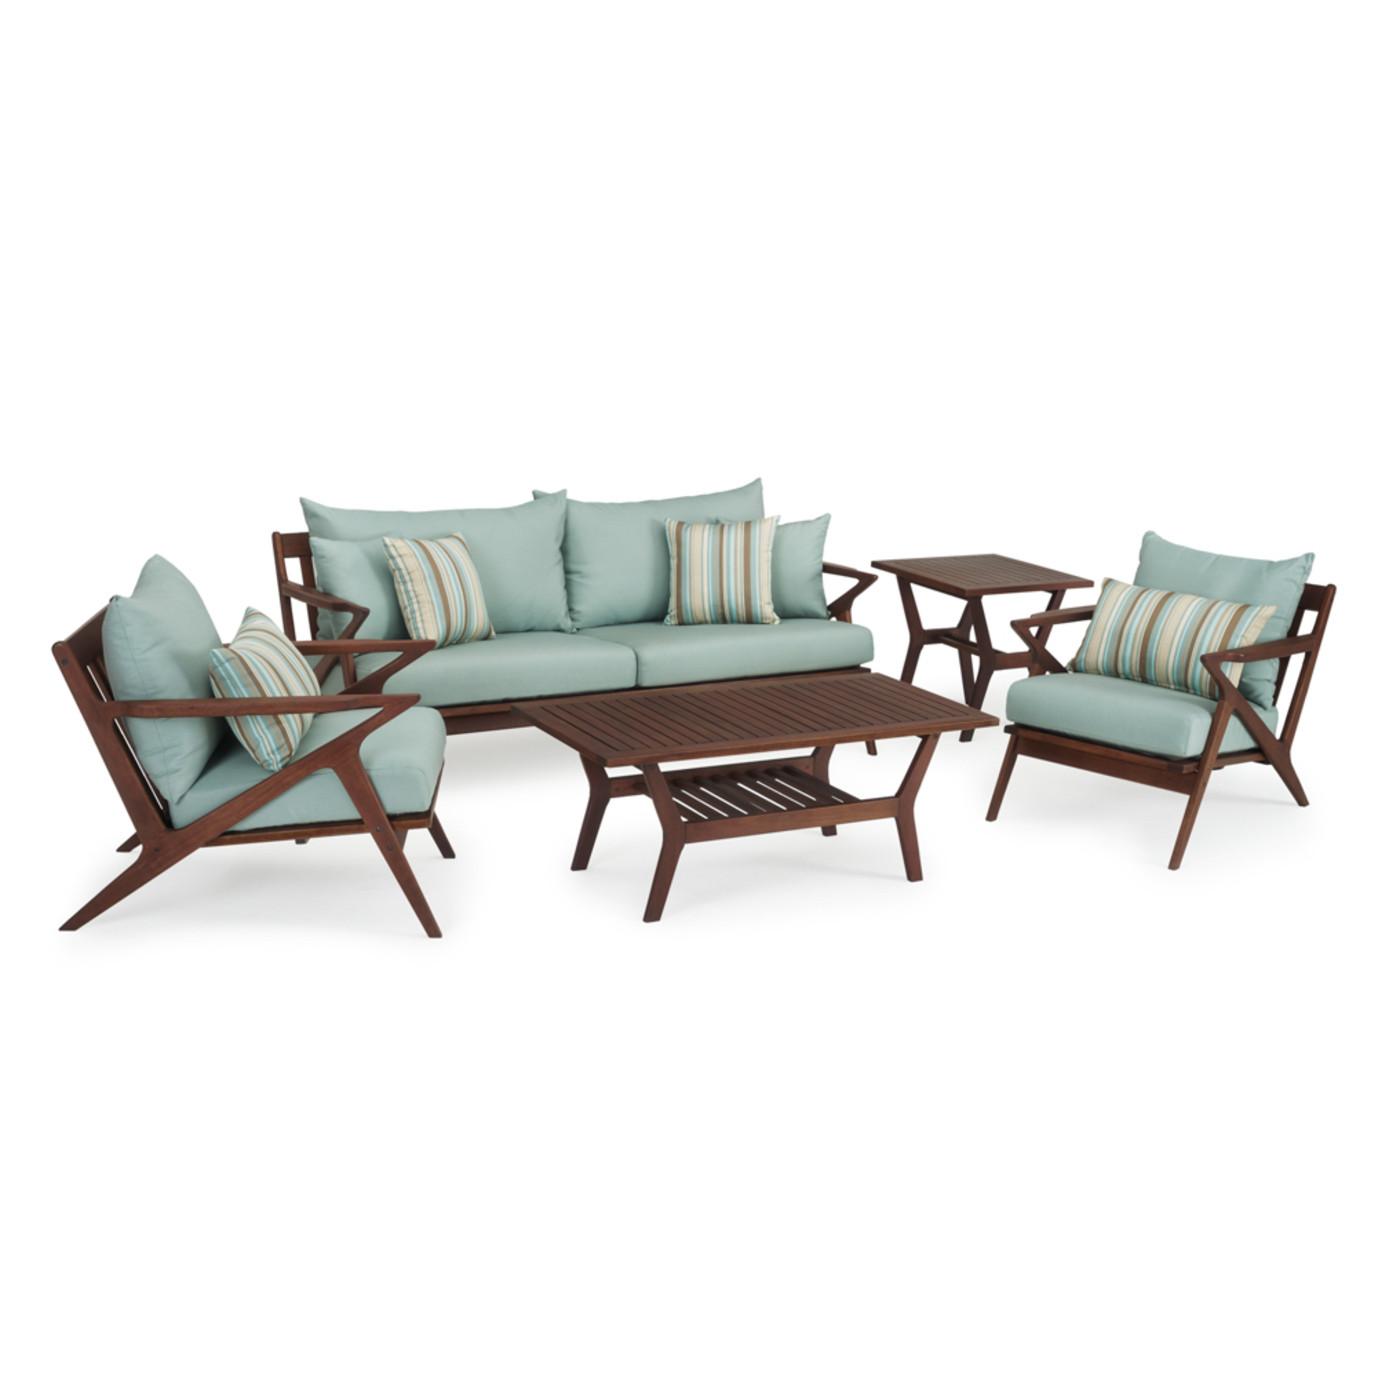 Vaughn 5pc Seating Set - Bliss Blue